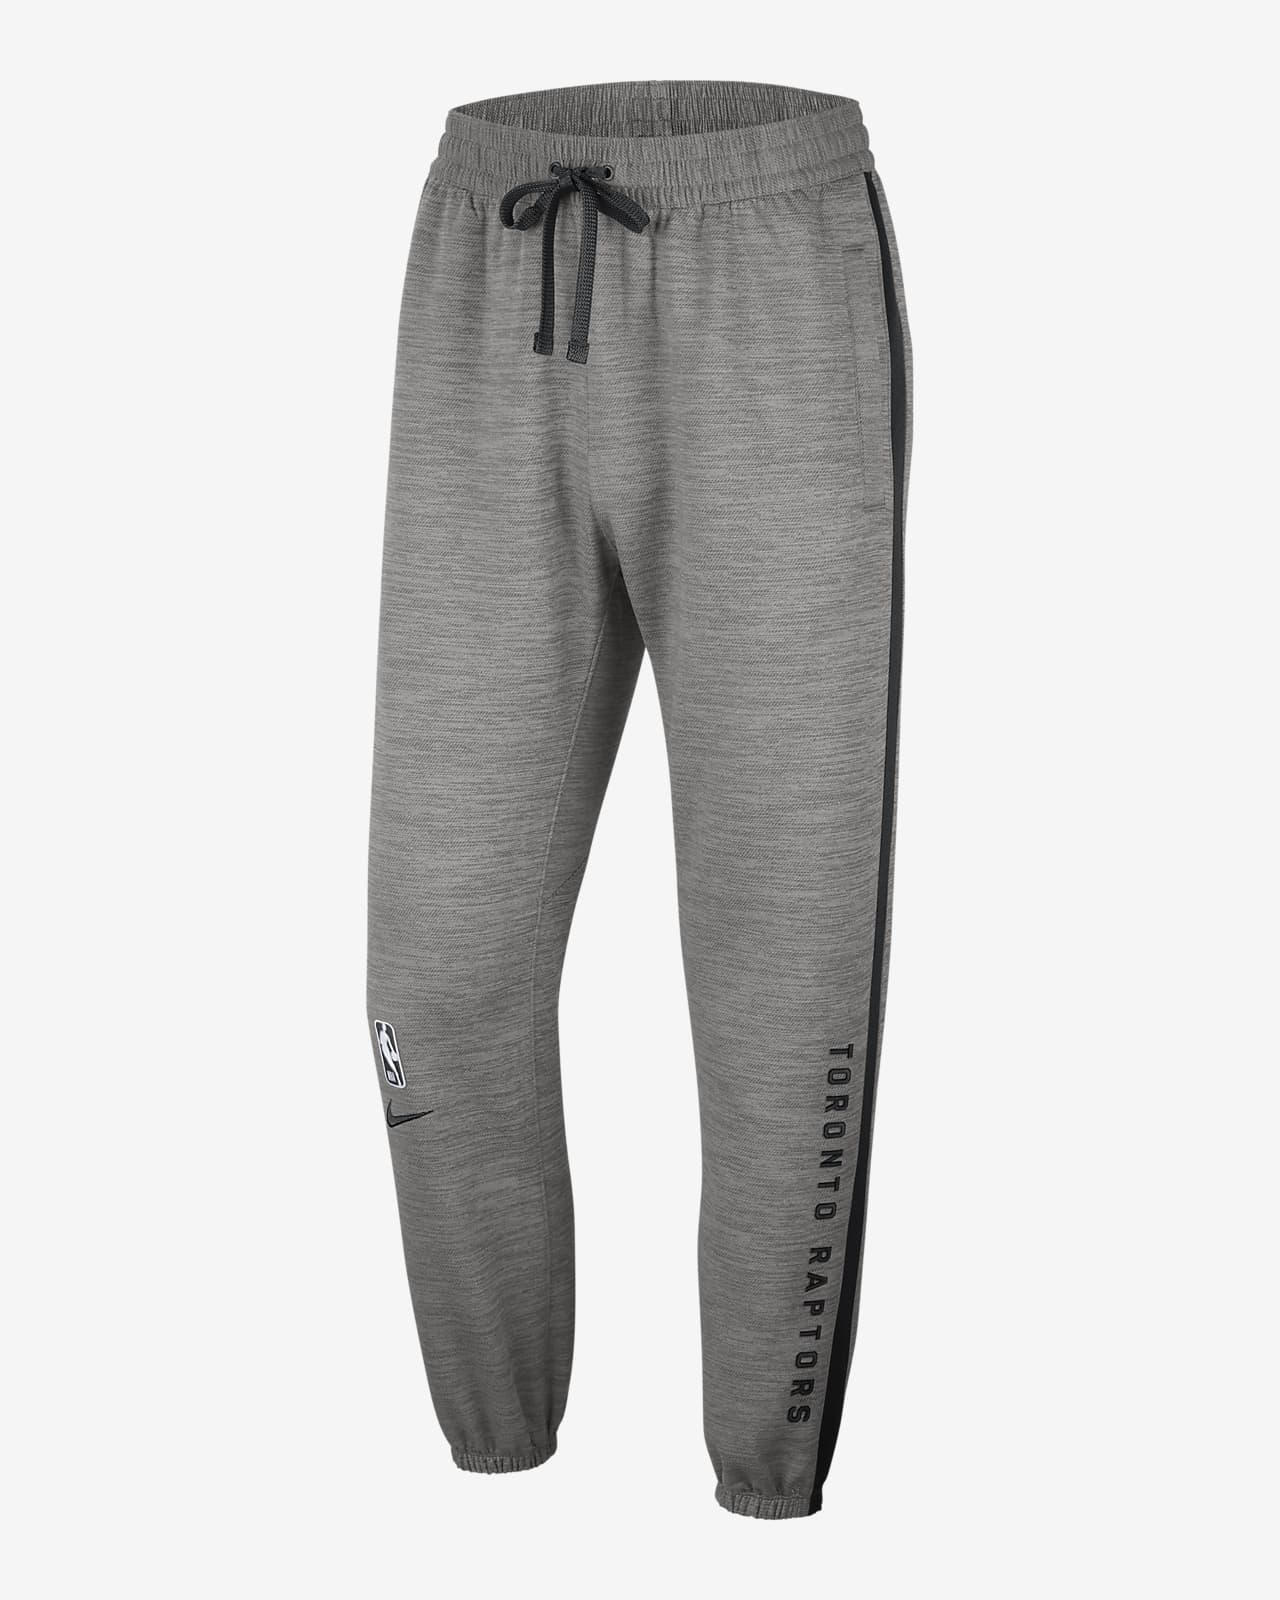 Raptors Showtime Men's Nike Therma Flex NBA Pants